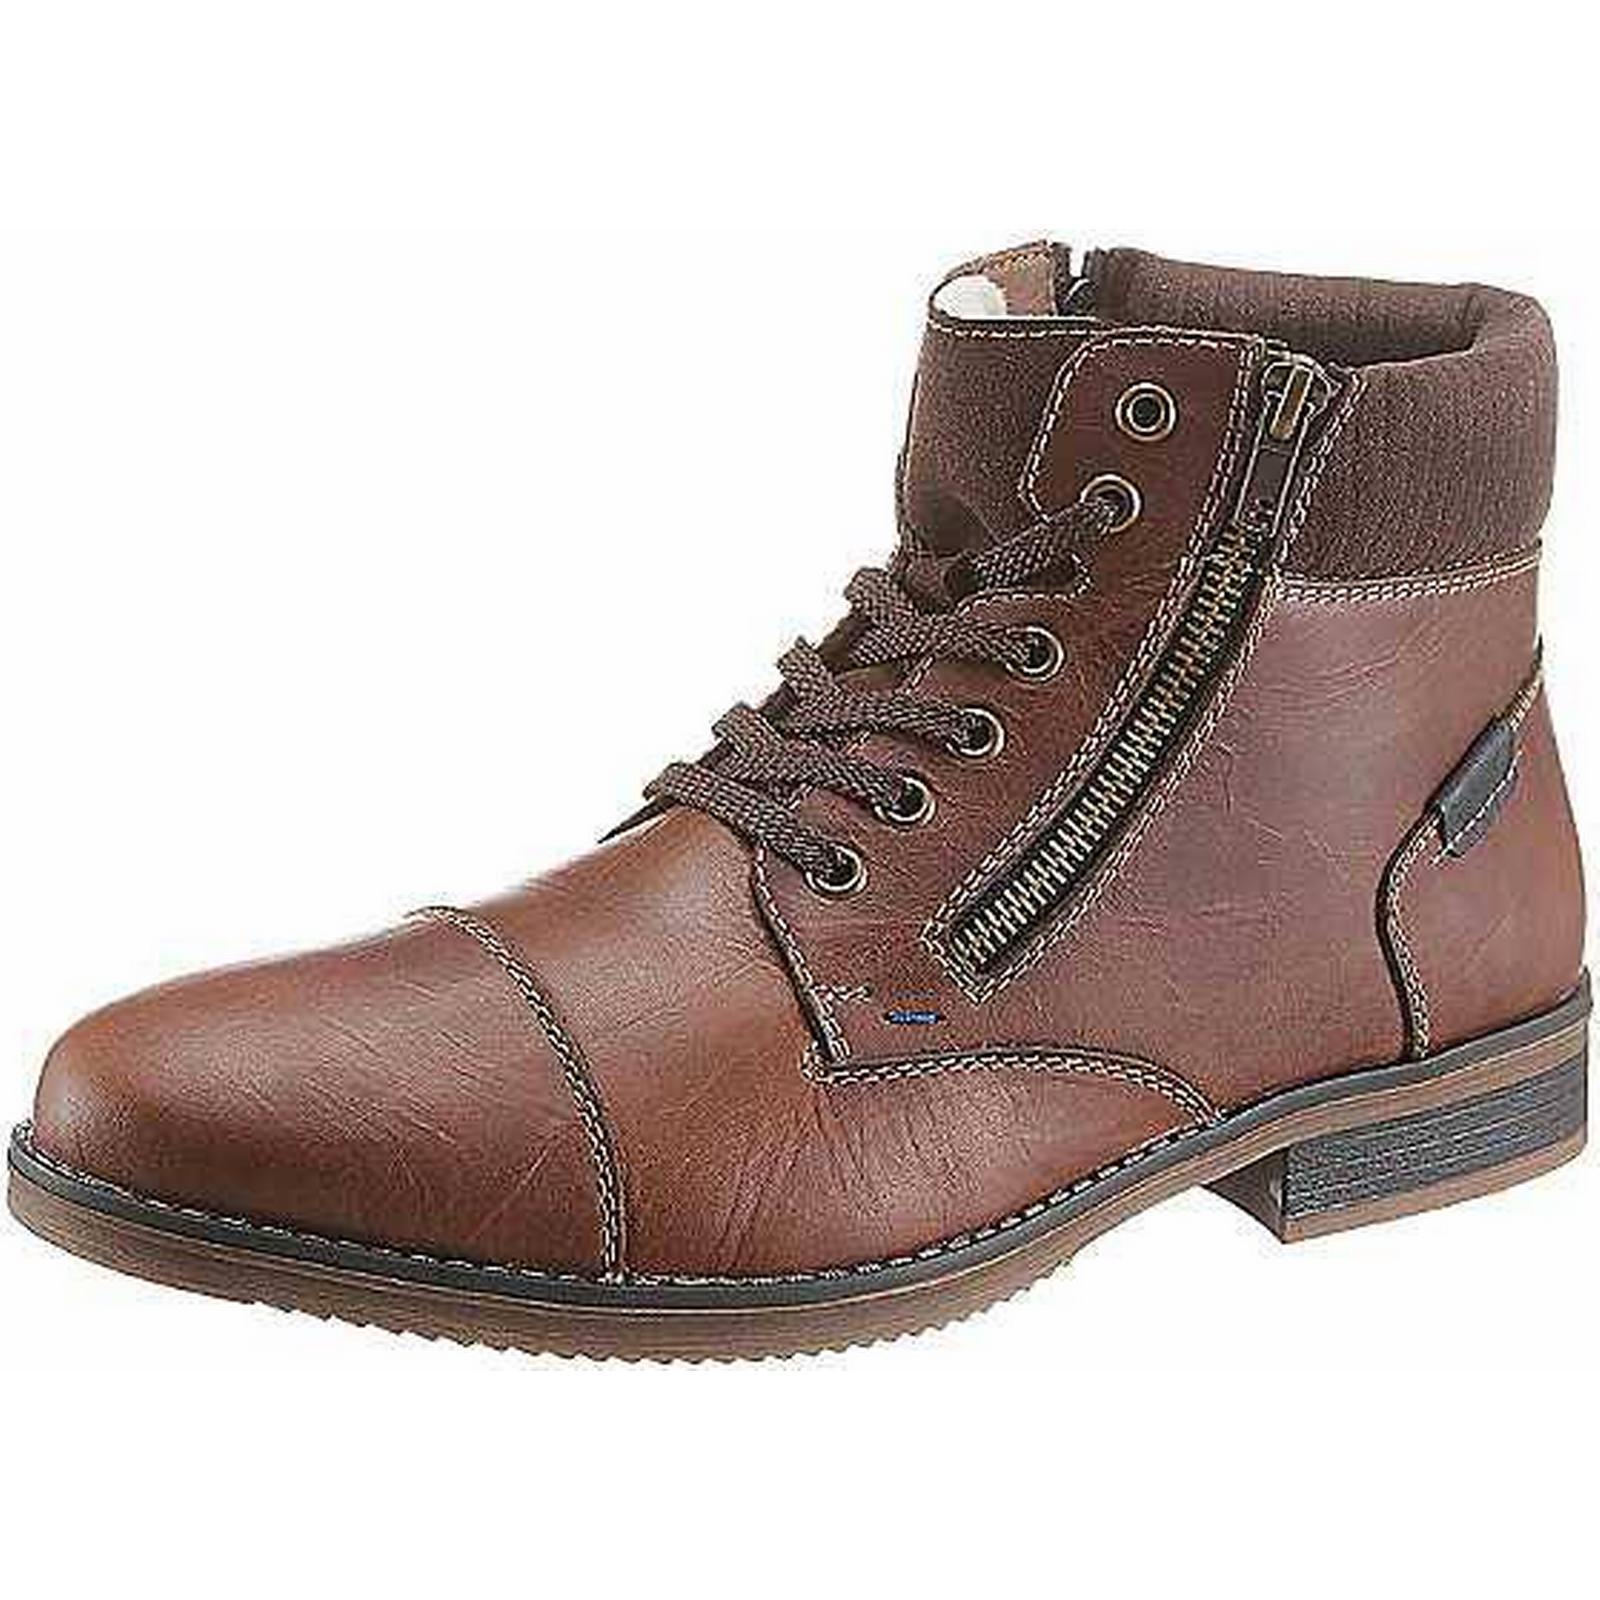 Rieker Rieker Lined Winter Boots by Rieker Rieker 494425